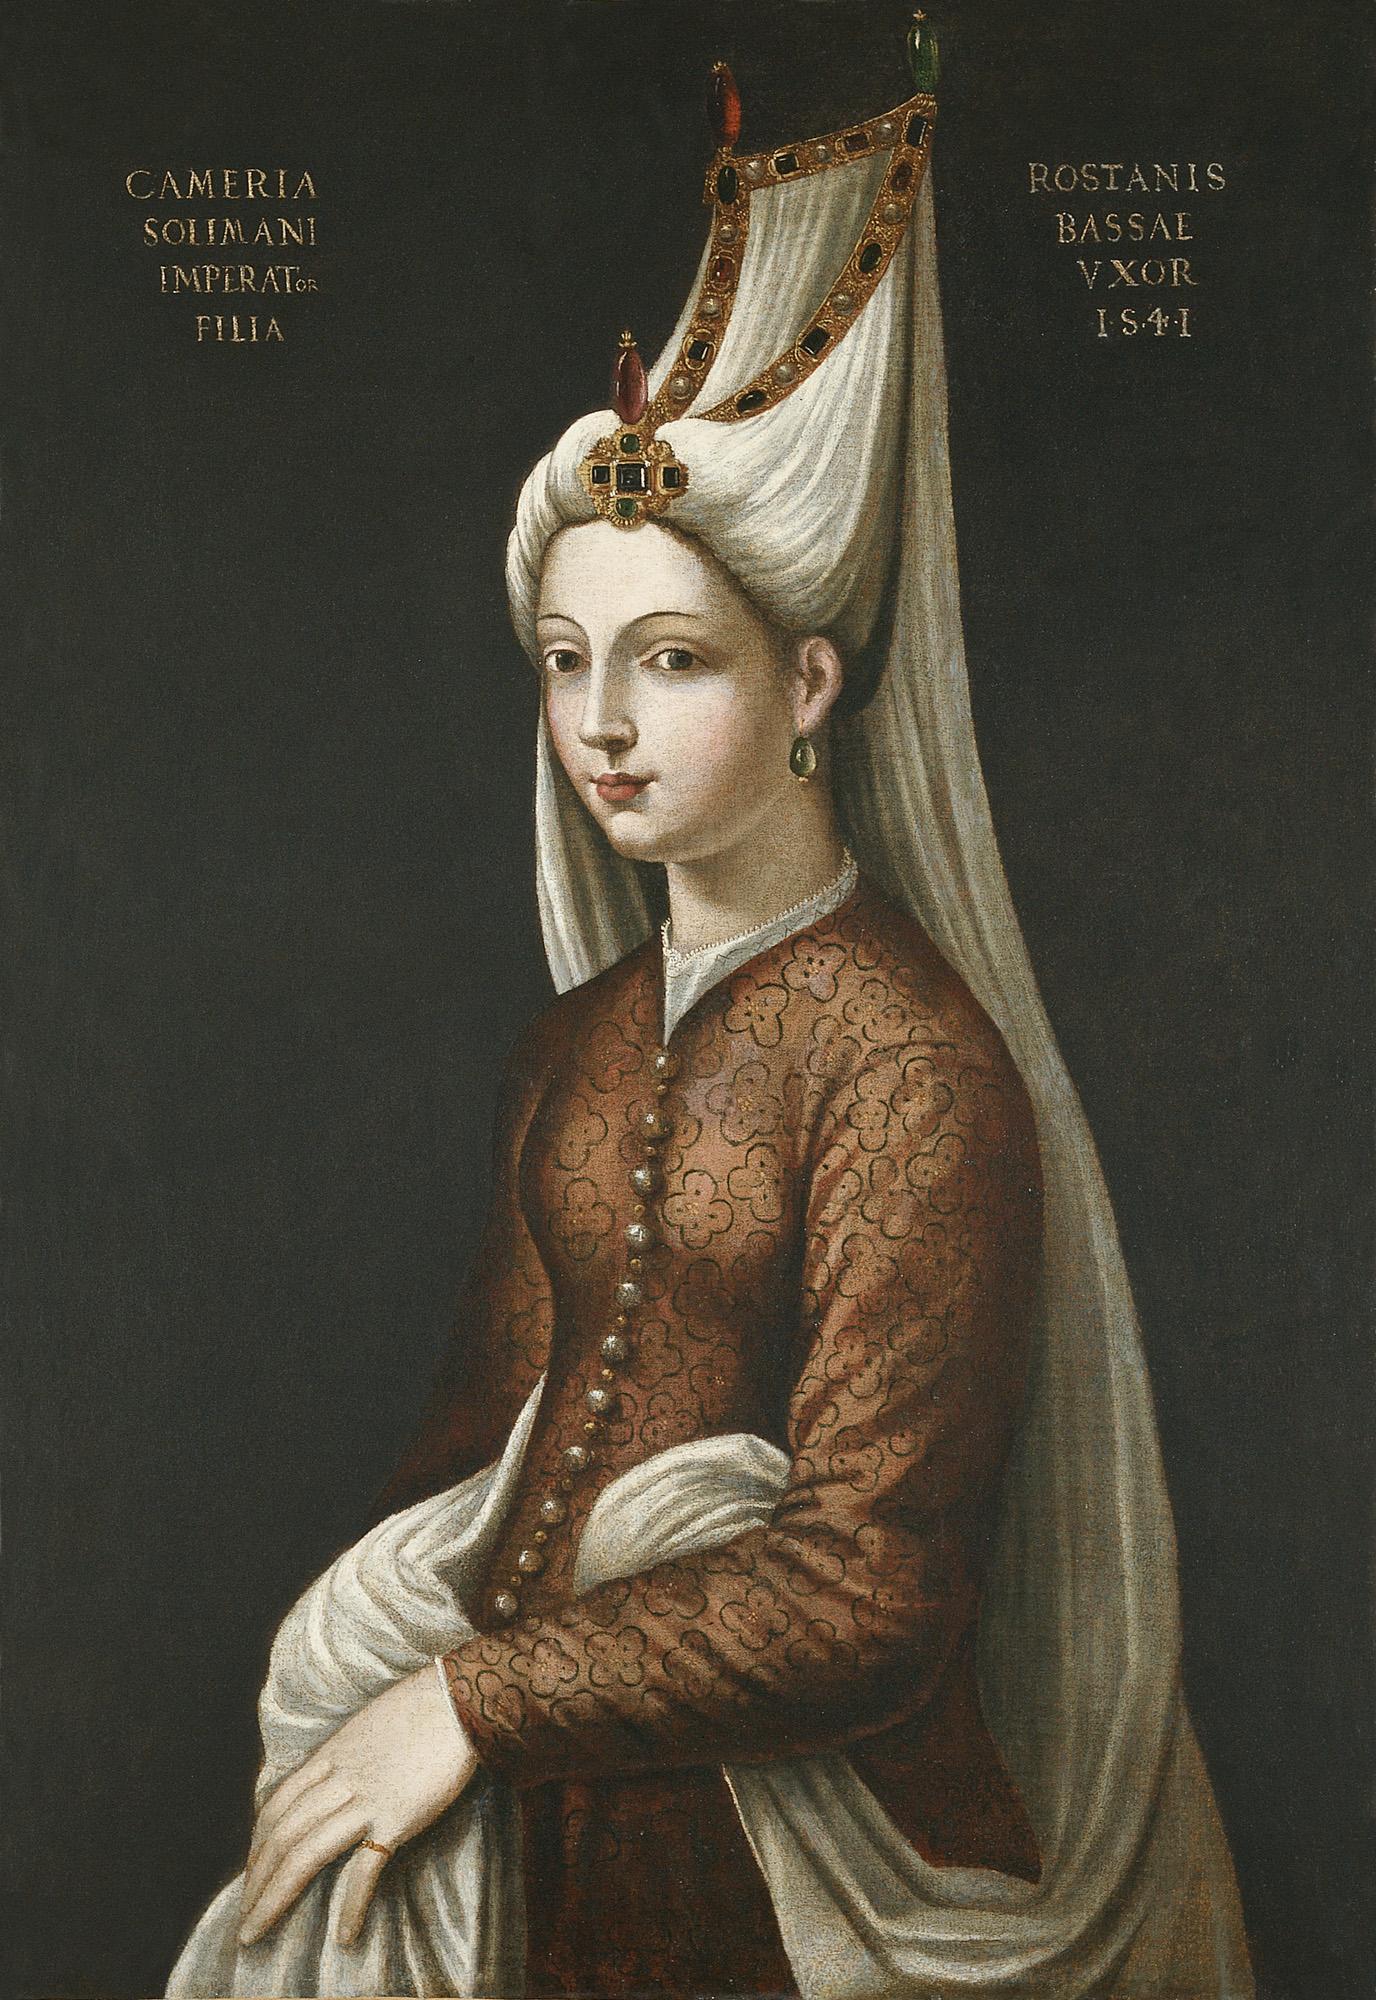 Mihrimah Sultan (I. Süleyman'ın kızı) - Vikipedi